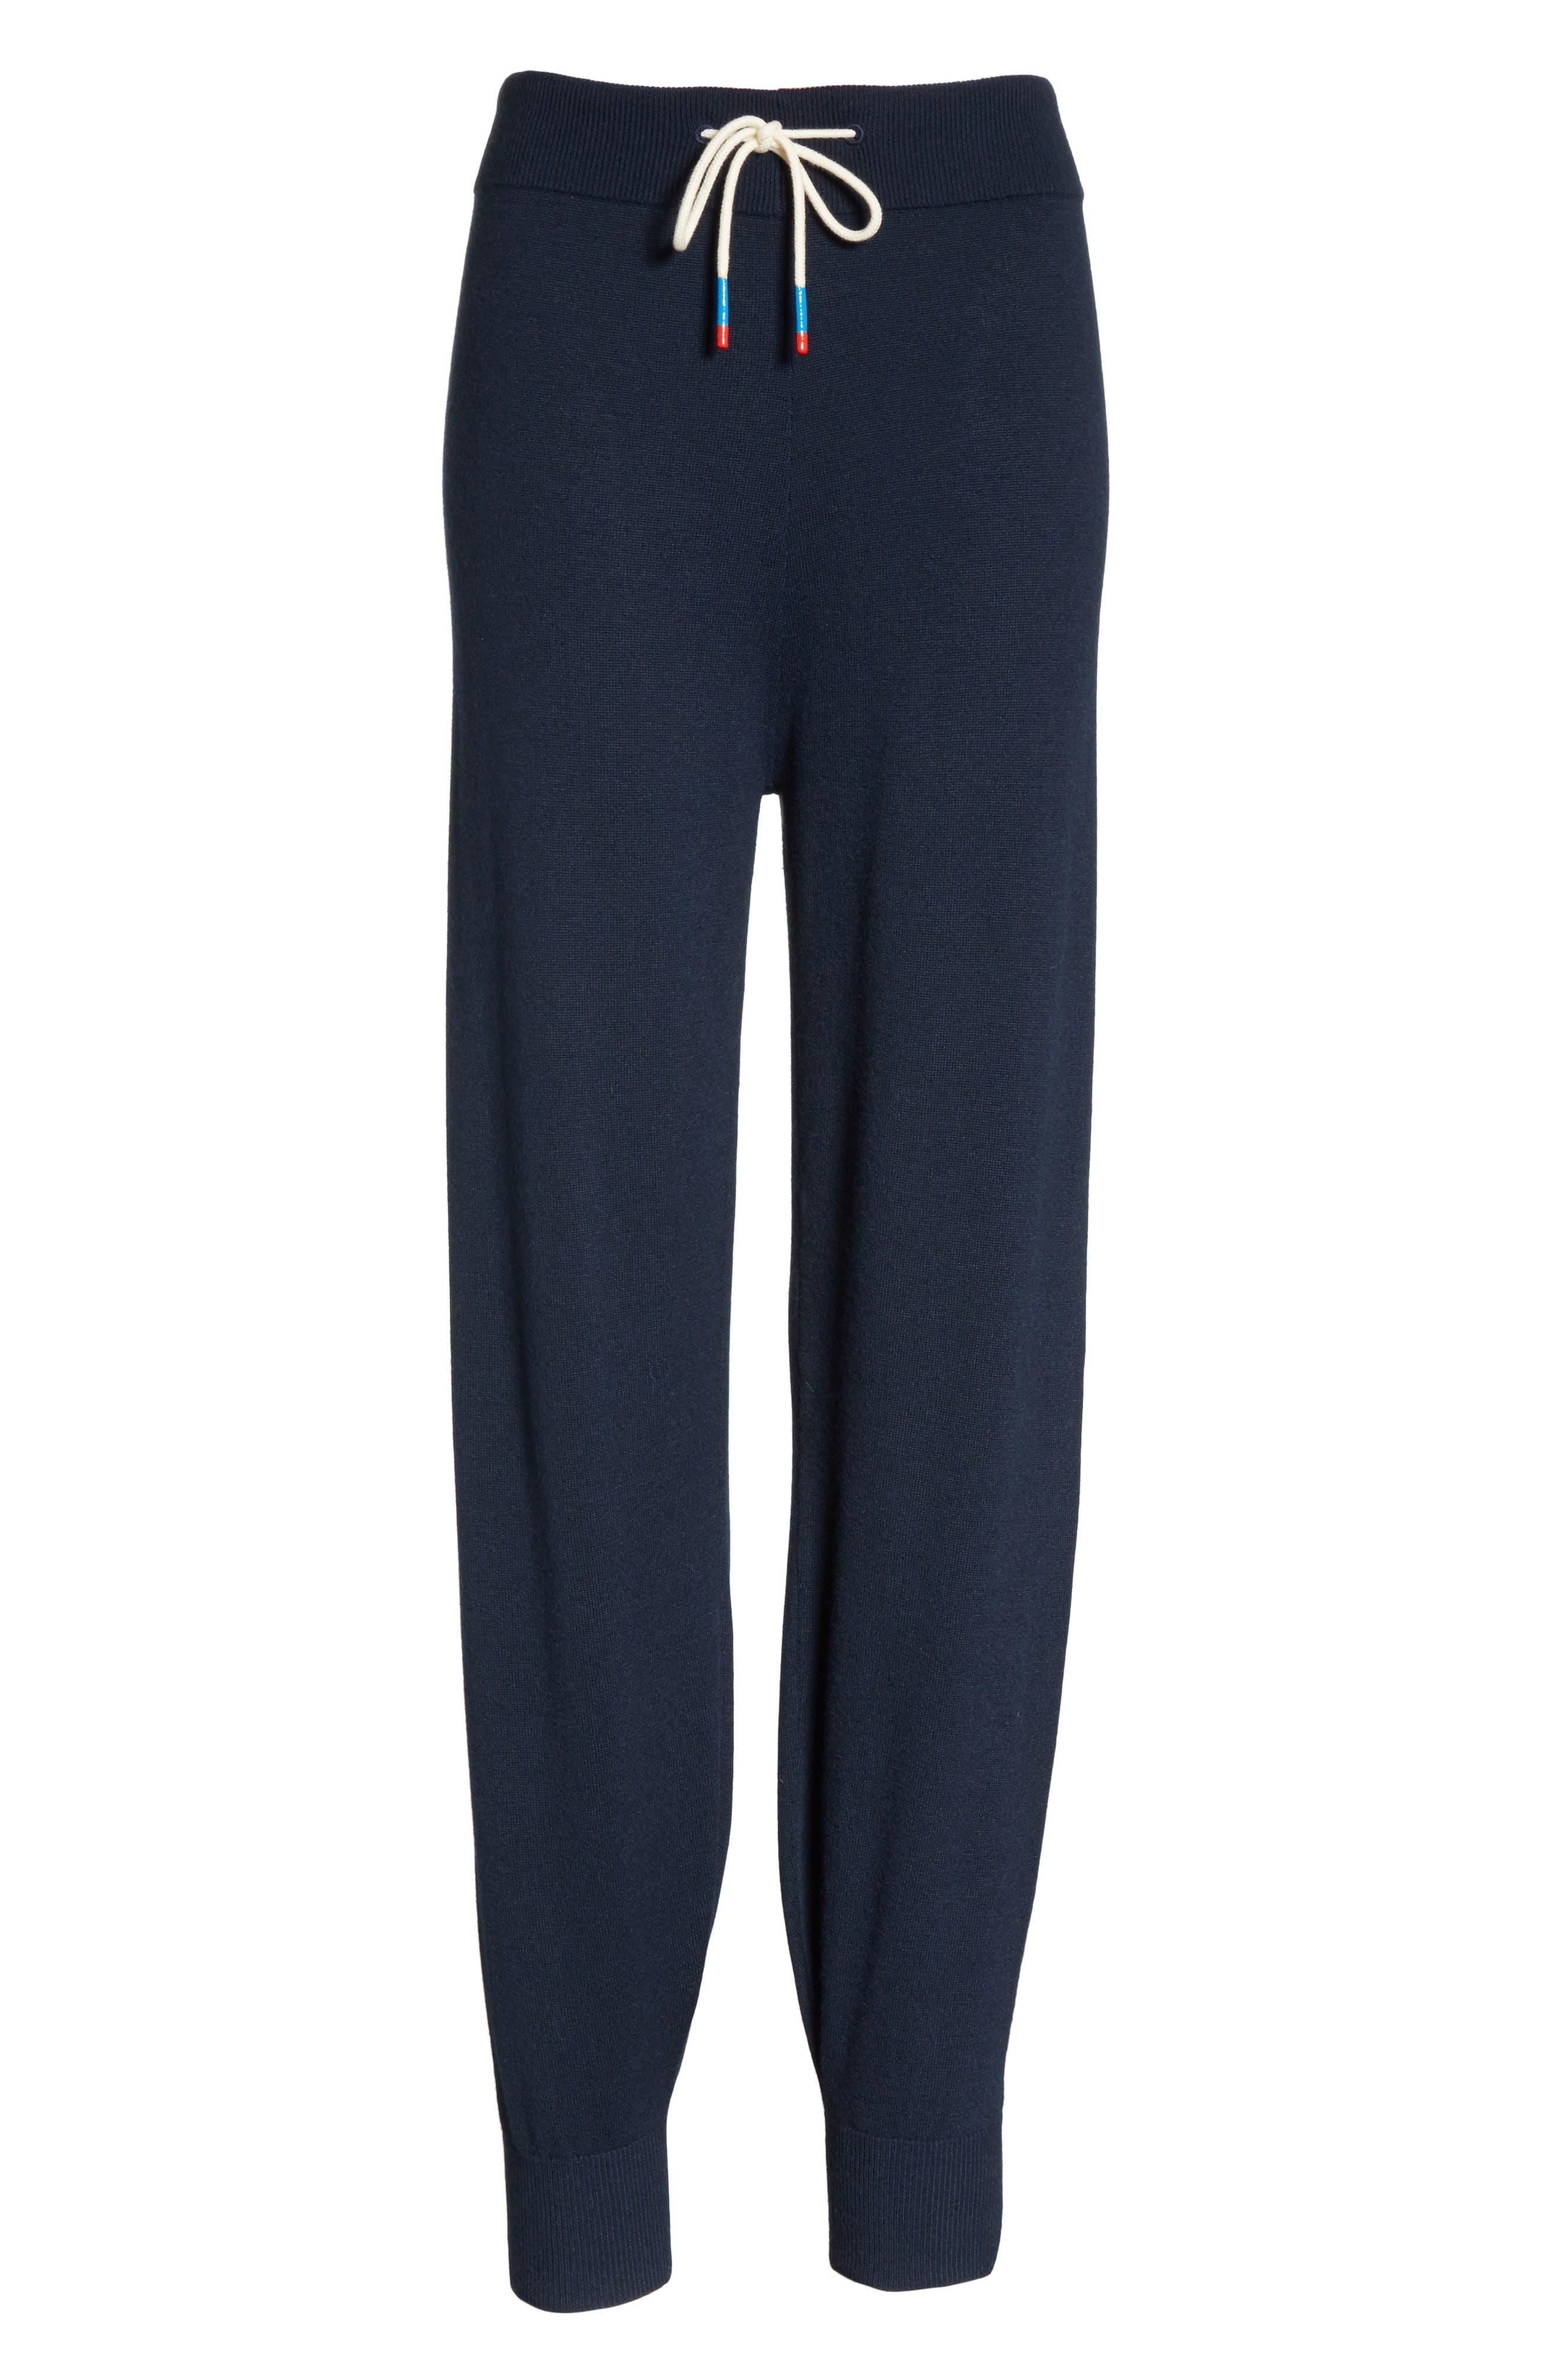 Performance Cashmere Blend Lounge Pants,                             Alternate thumbnail 7, color,                             Tory Navy